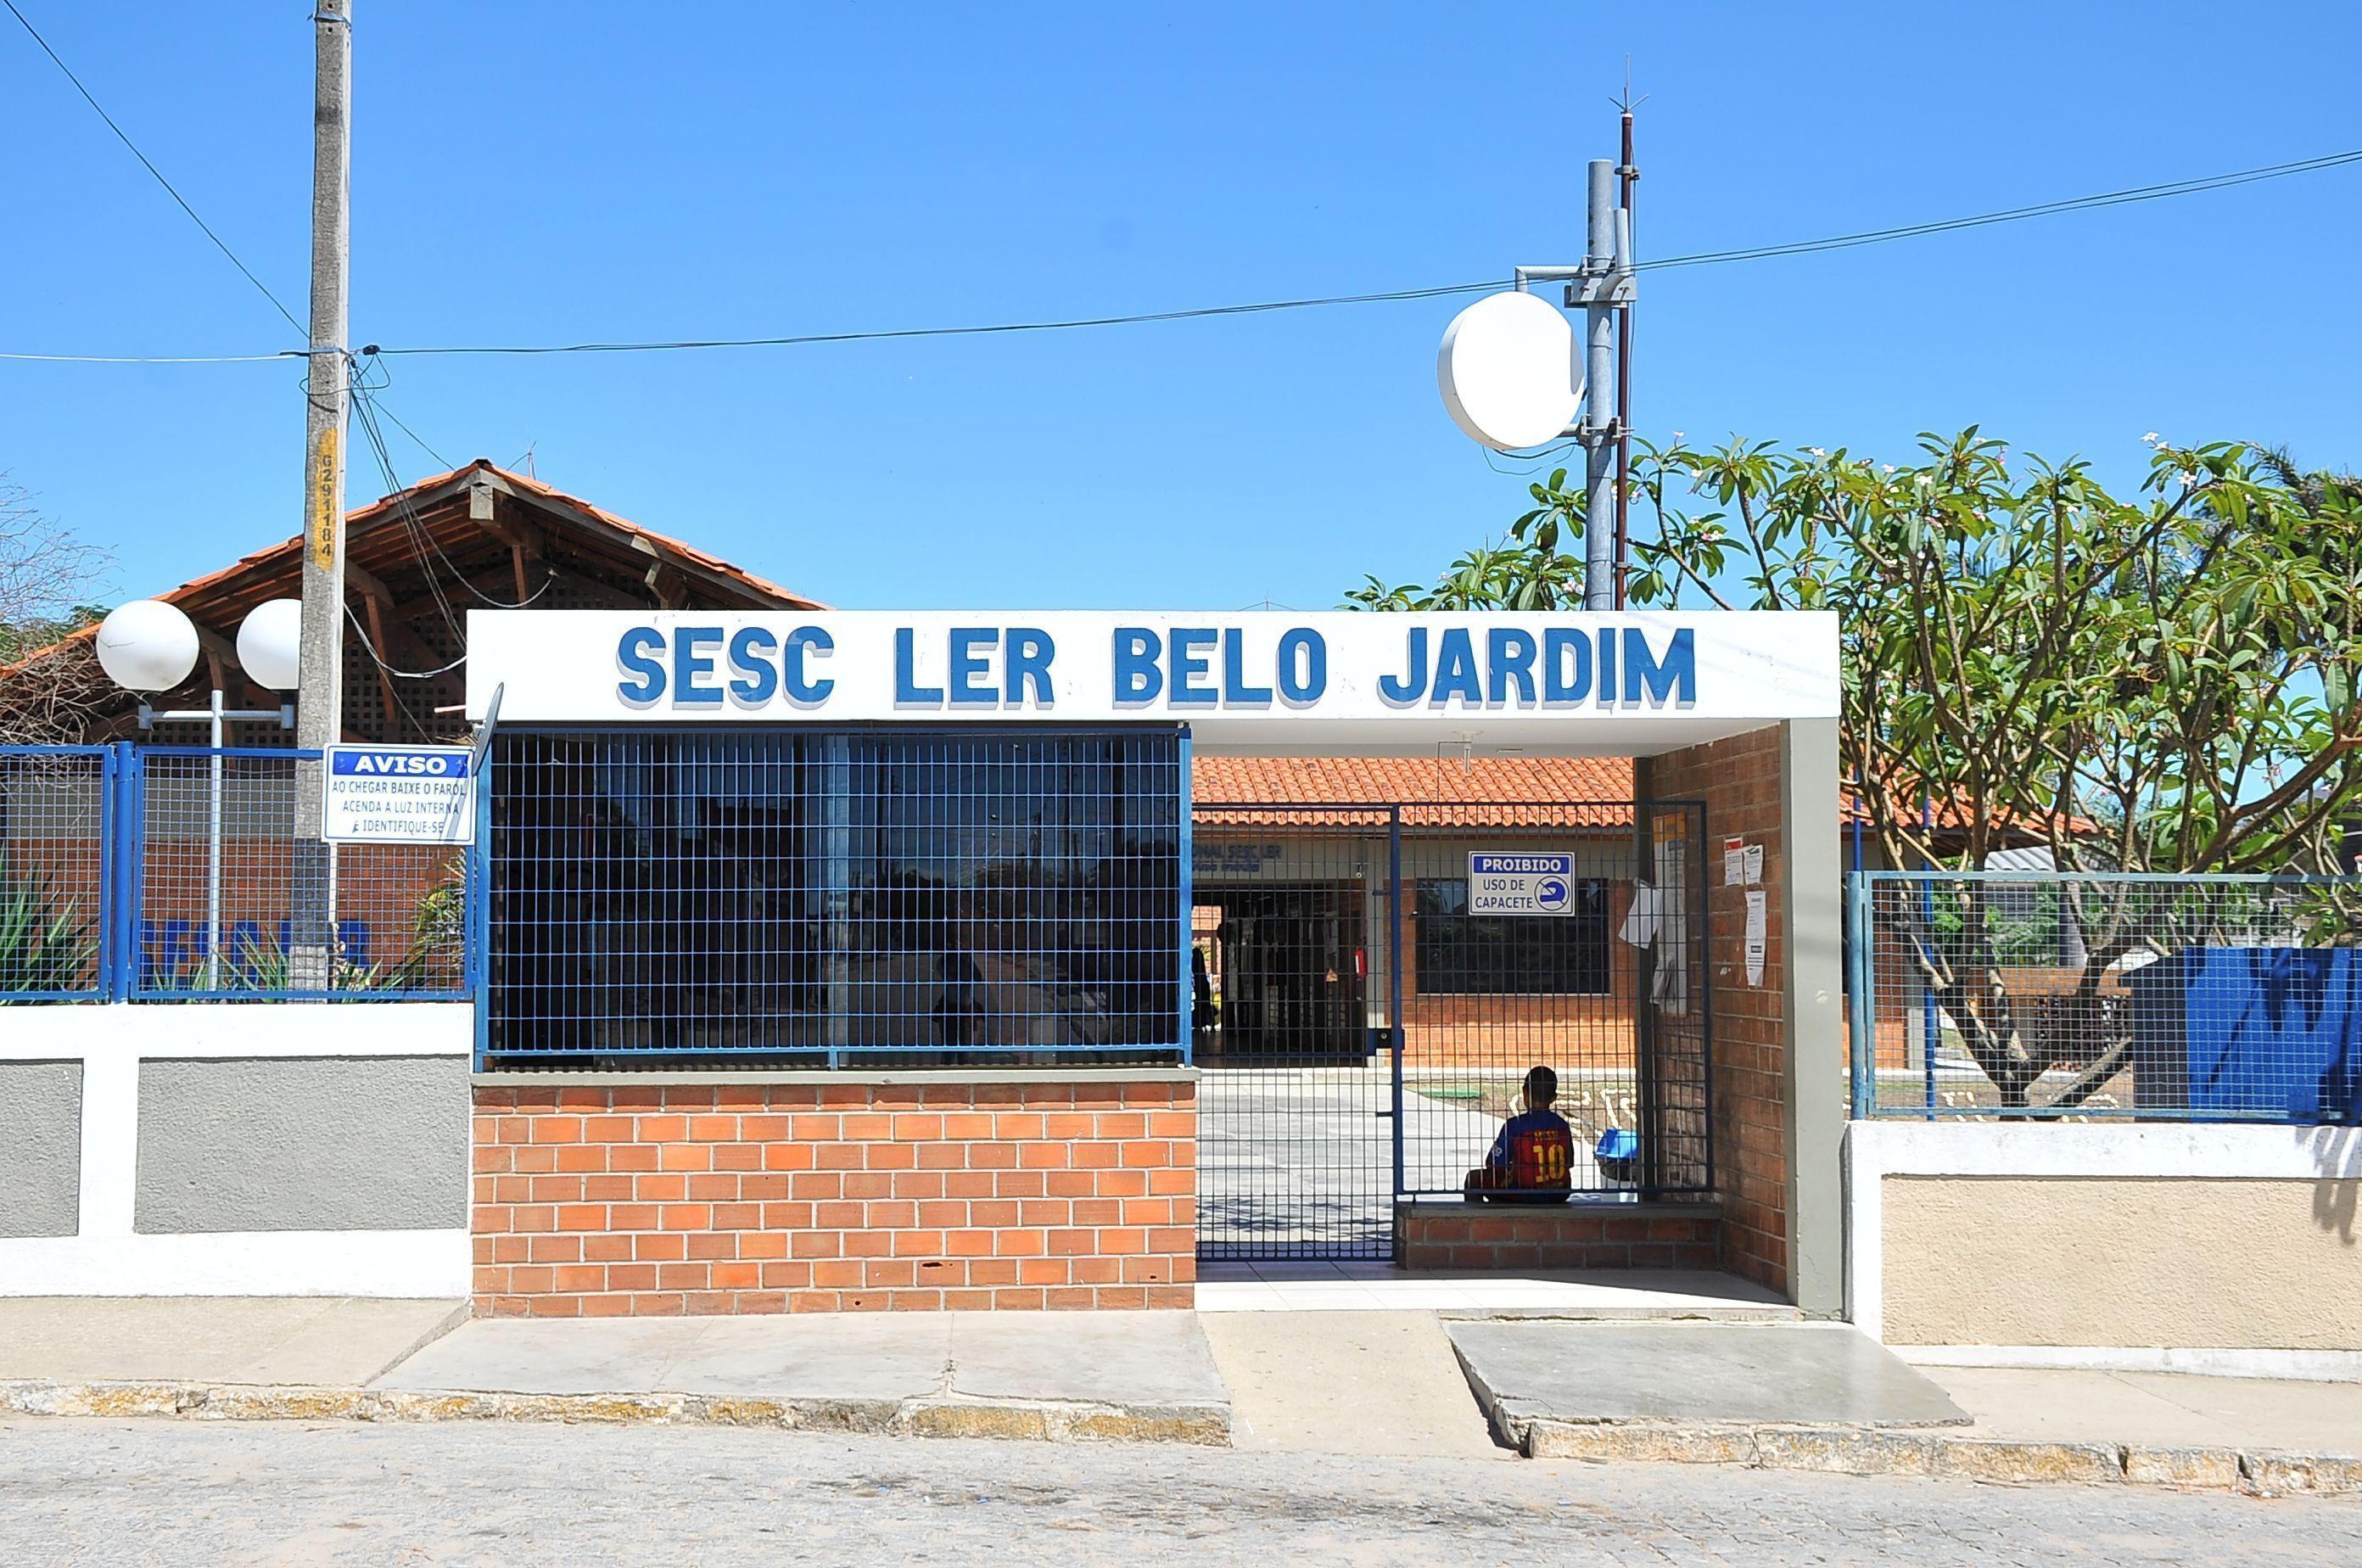 Foto: Ascom/Sesc Ler